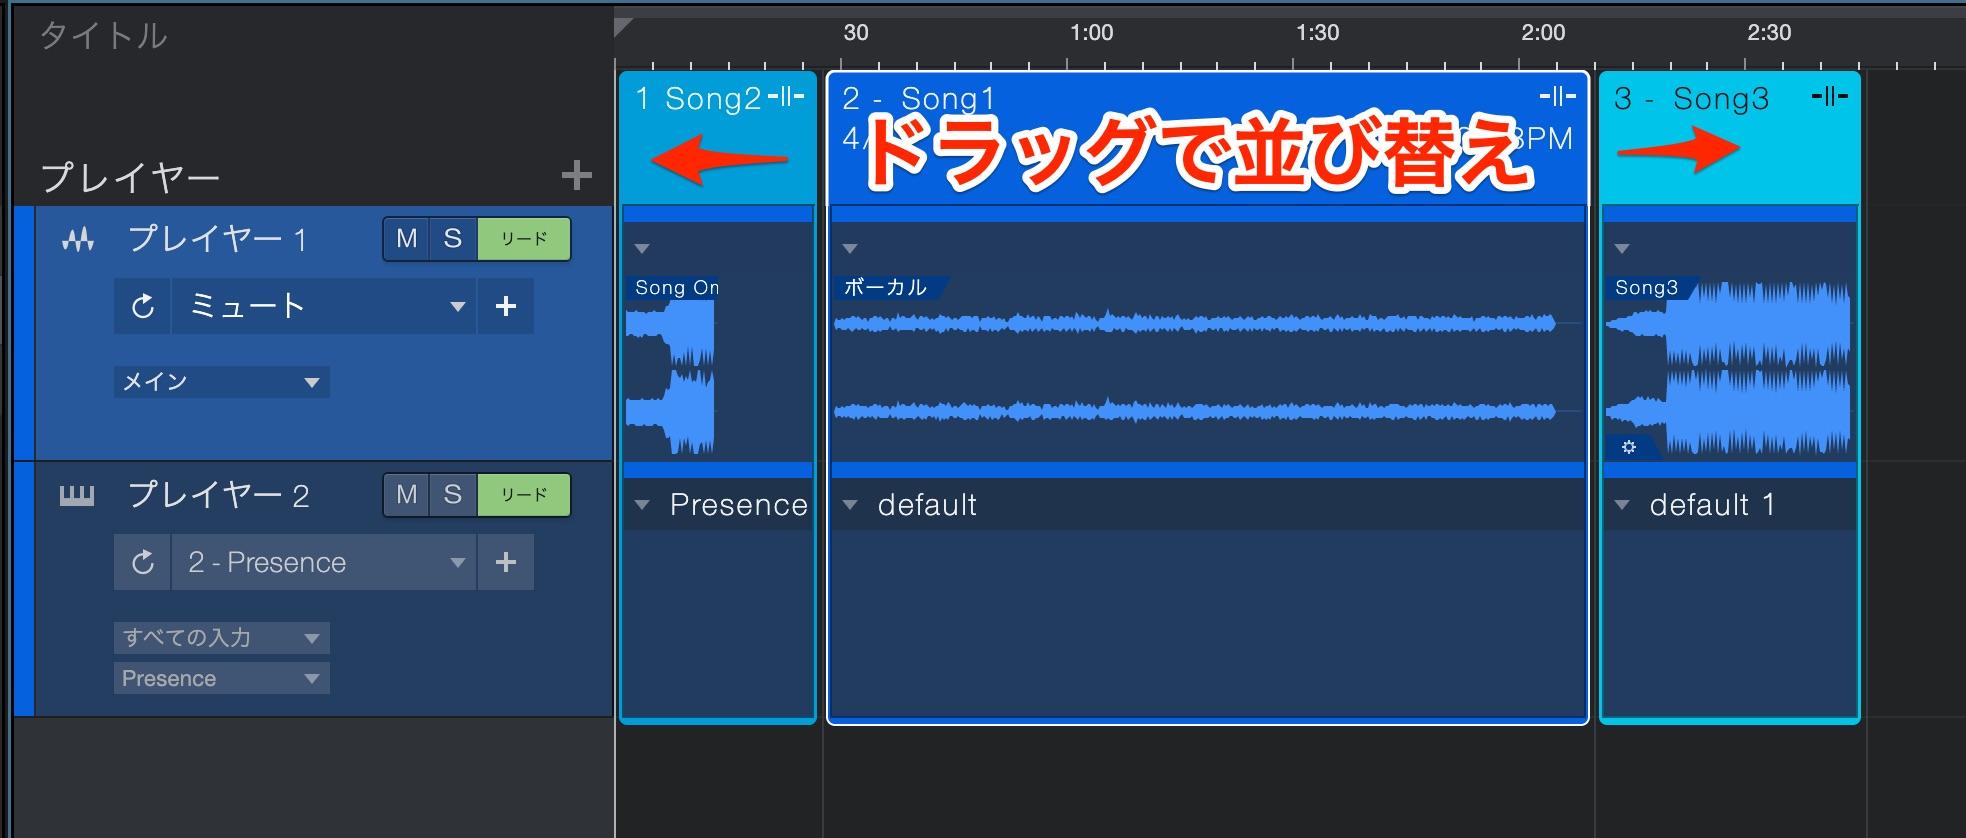 Studio_One_-_新規ショー